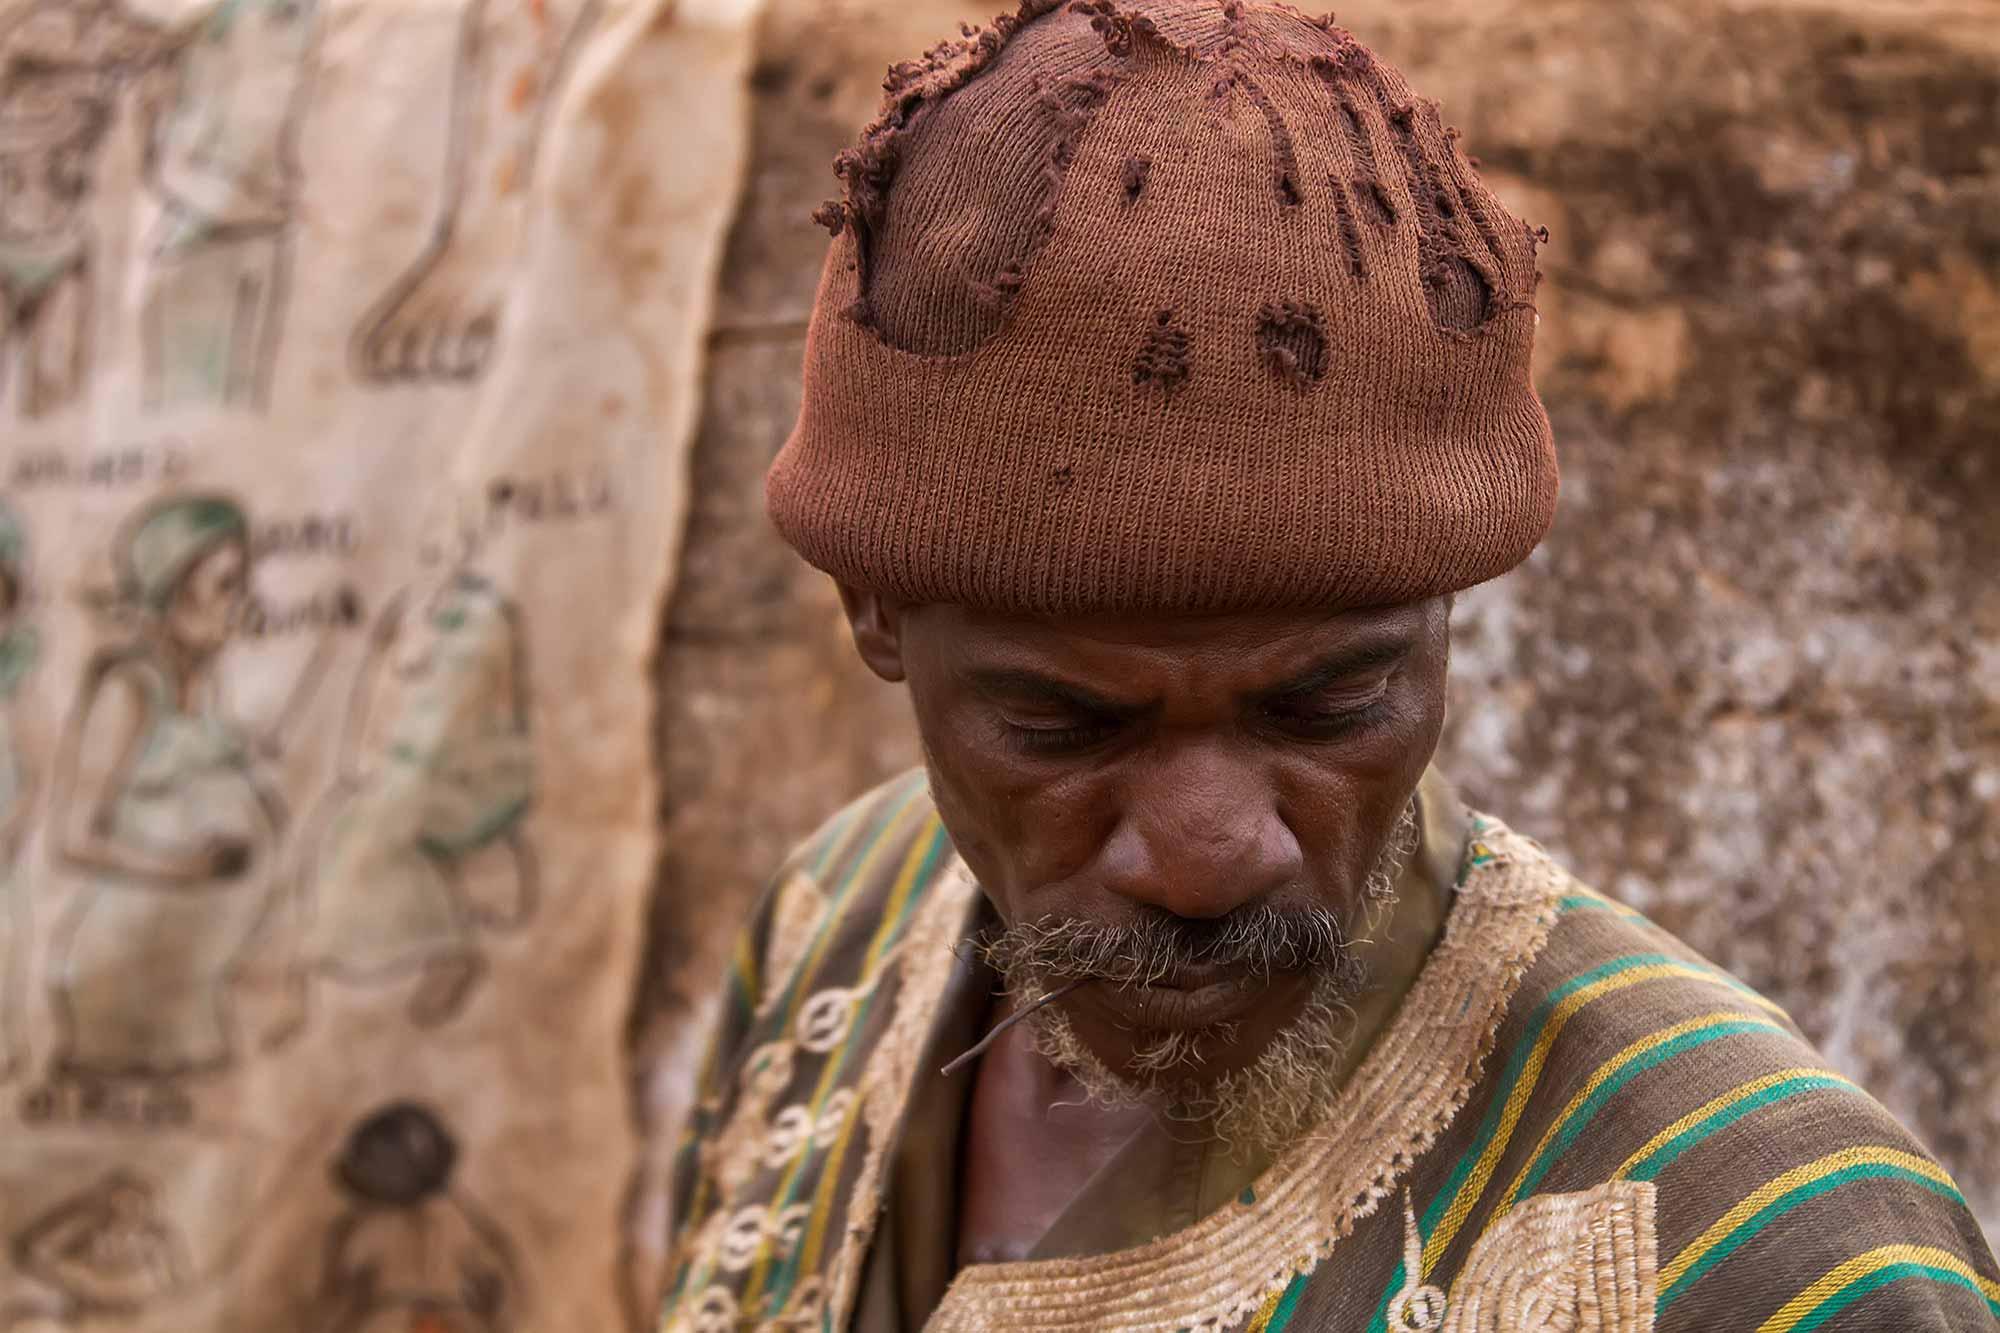 portrait-vodoo-seller-burkina-faso-africa